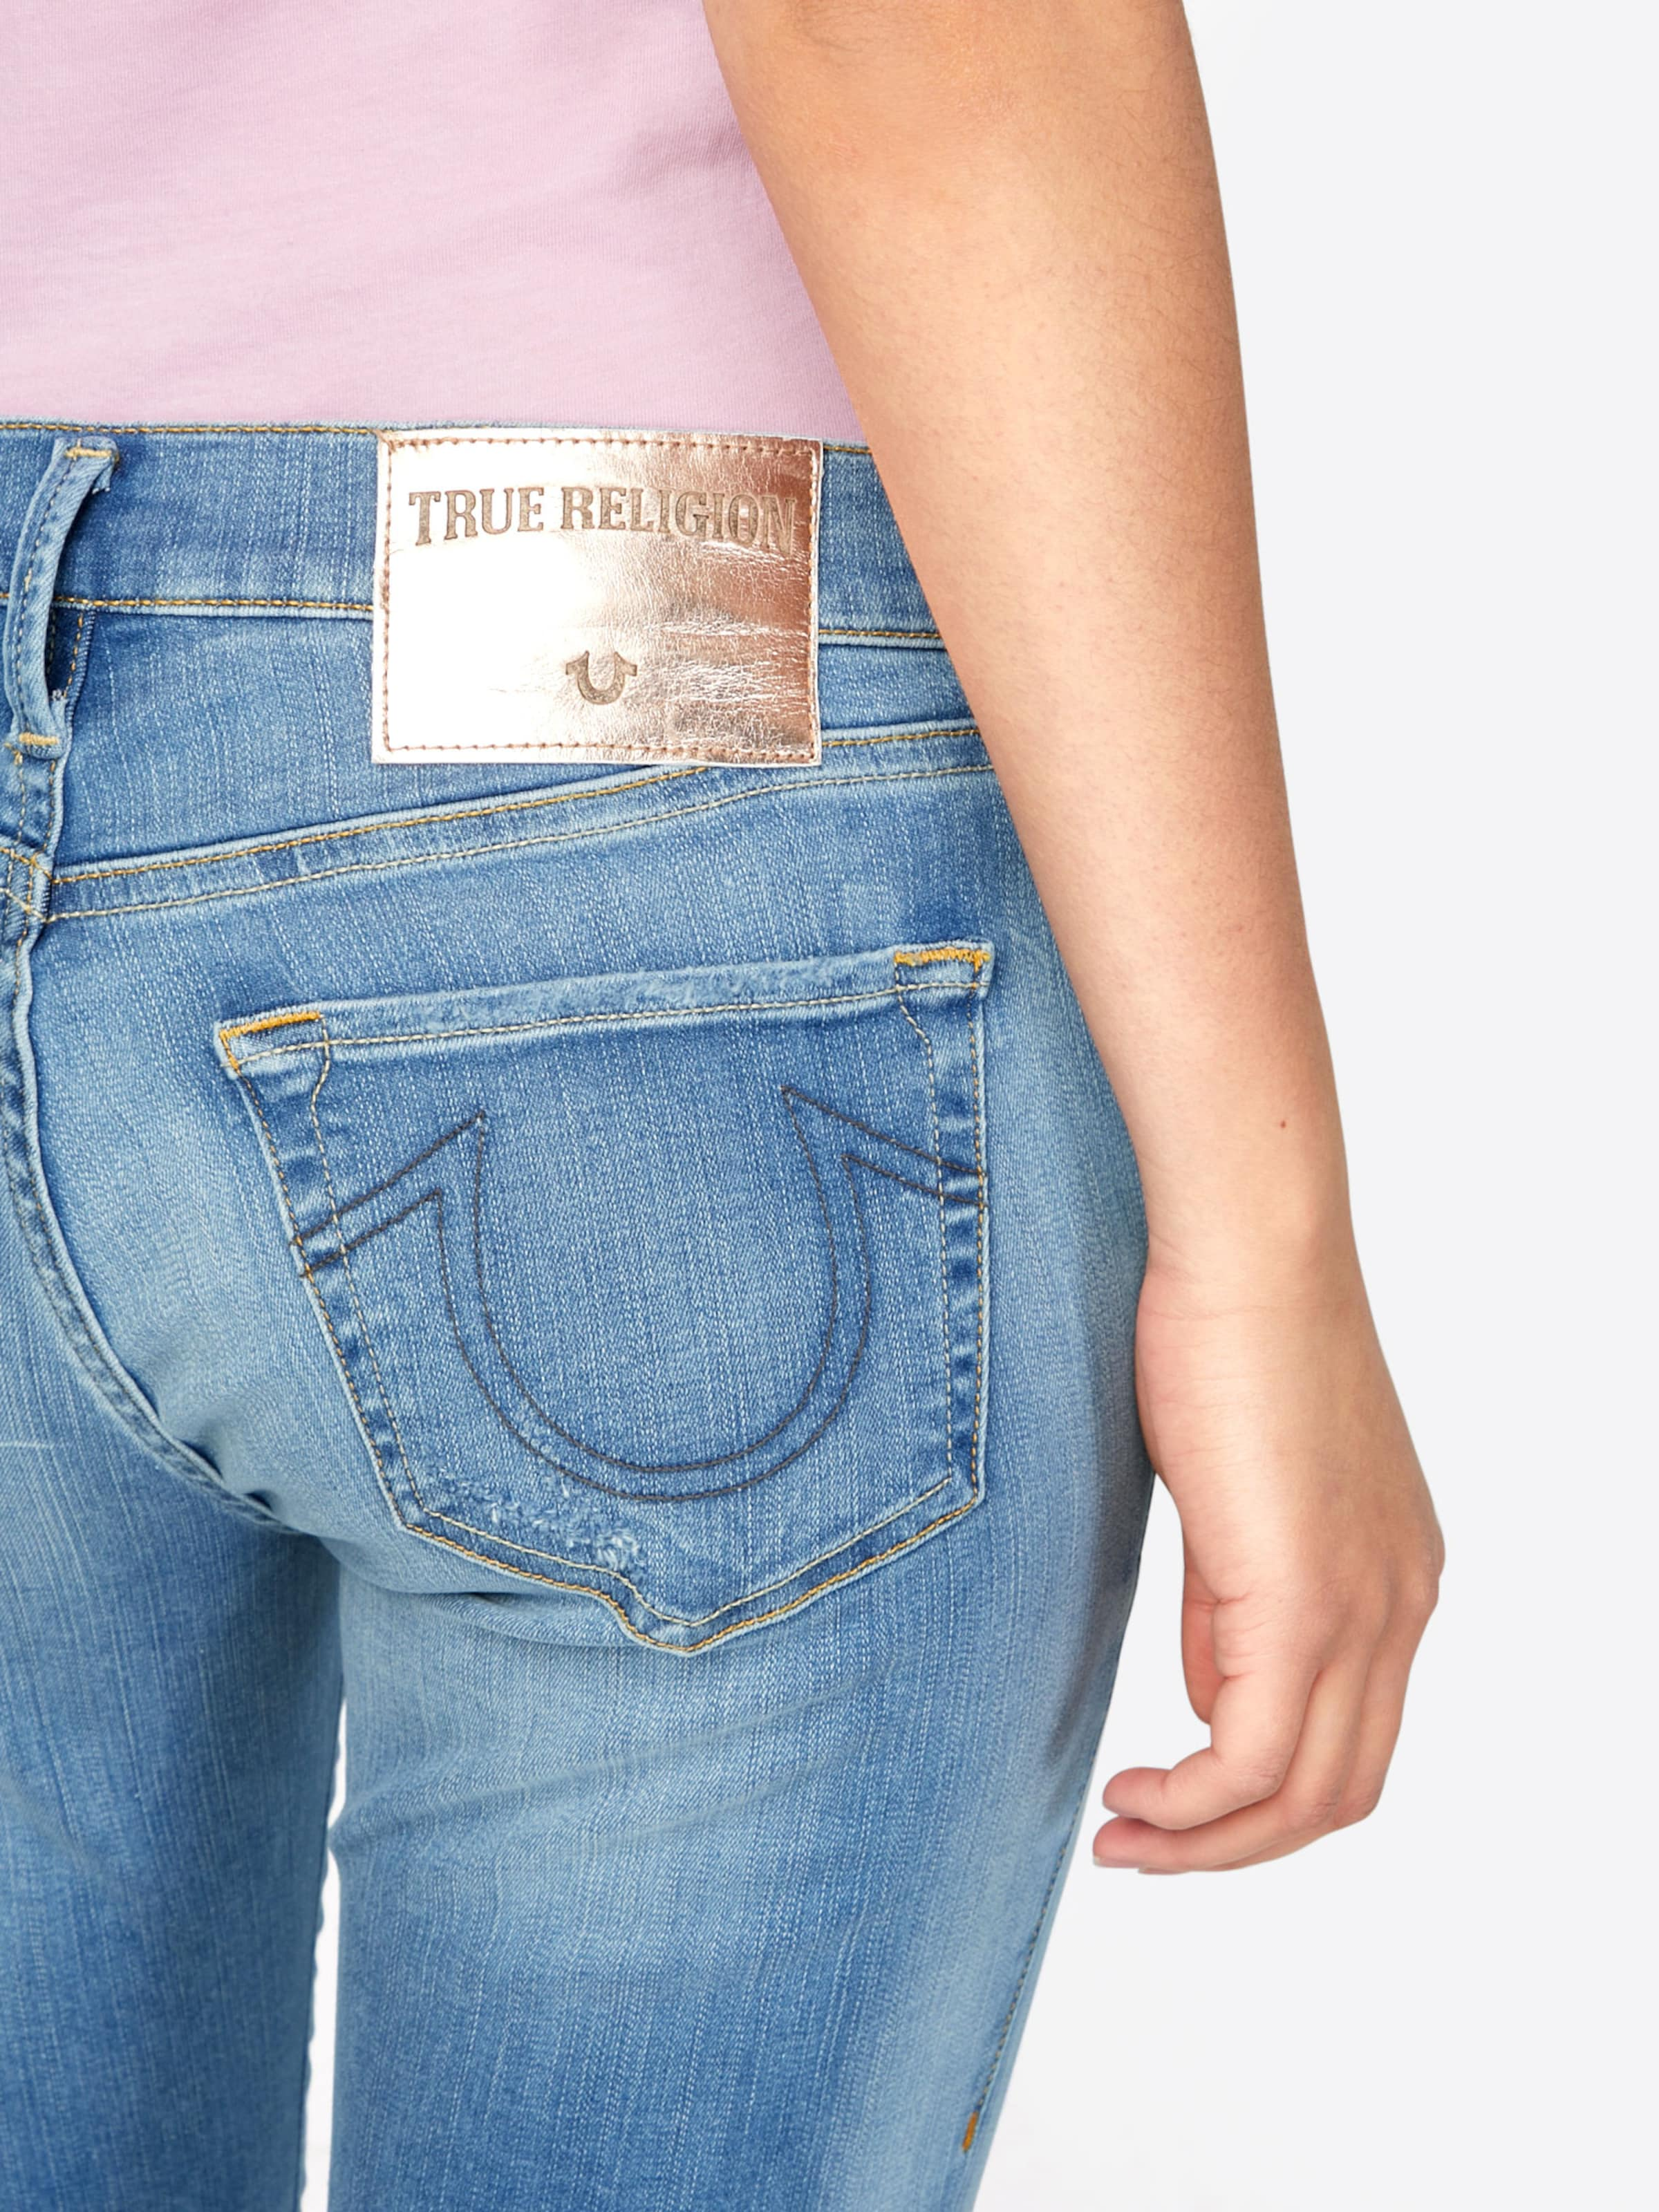 True Religion Mid Waist Jeans 'HALLE SPECIAL' Guter Service nLbcHt35DO